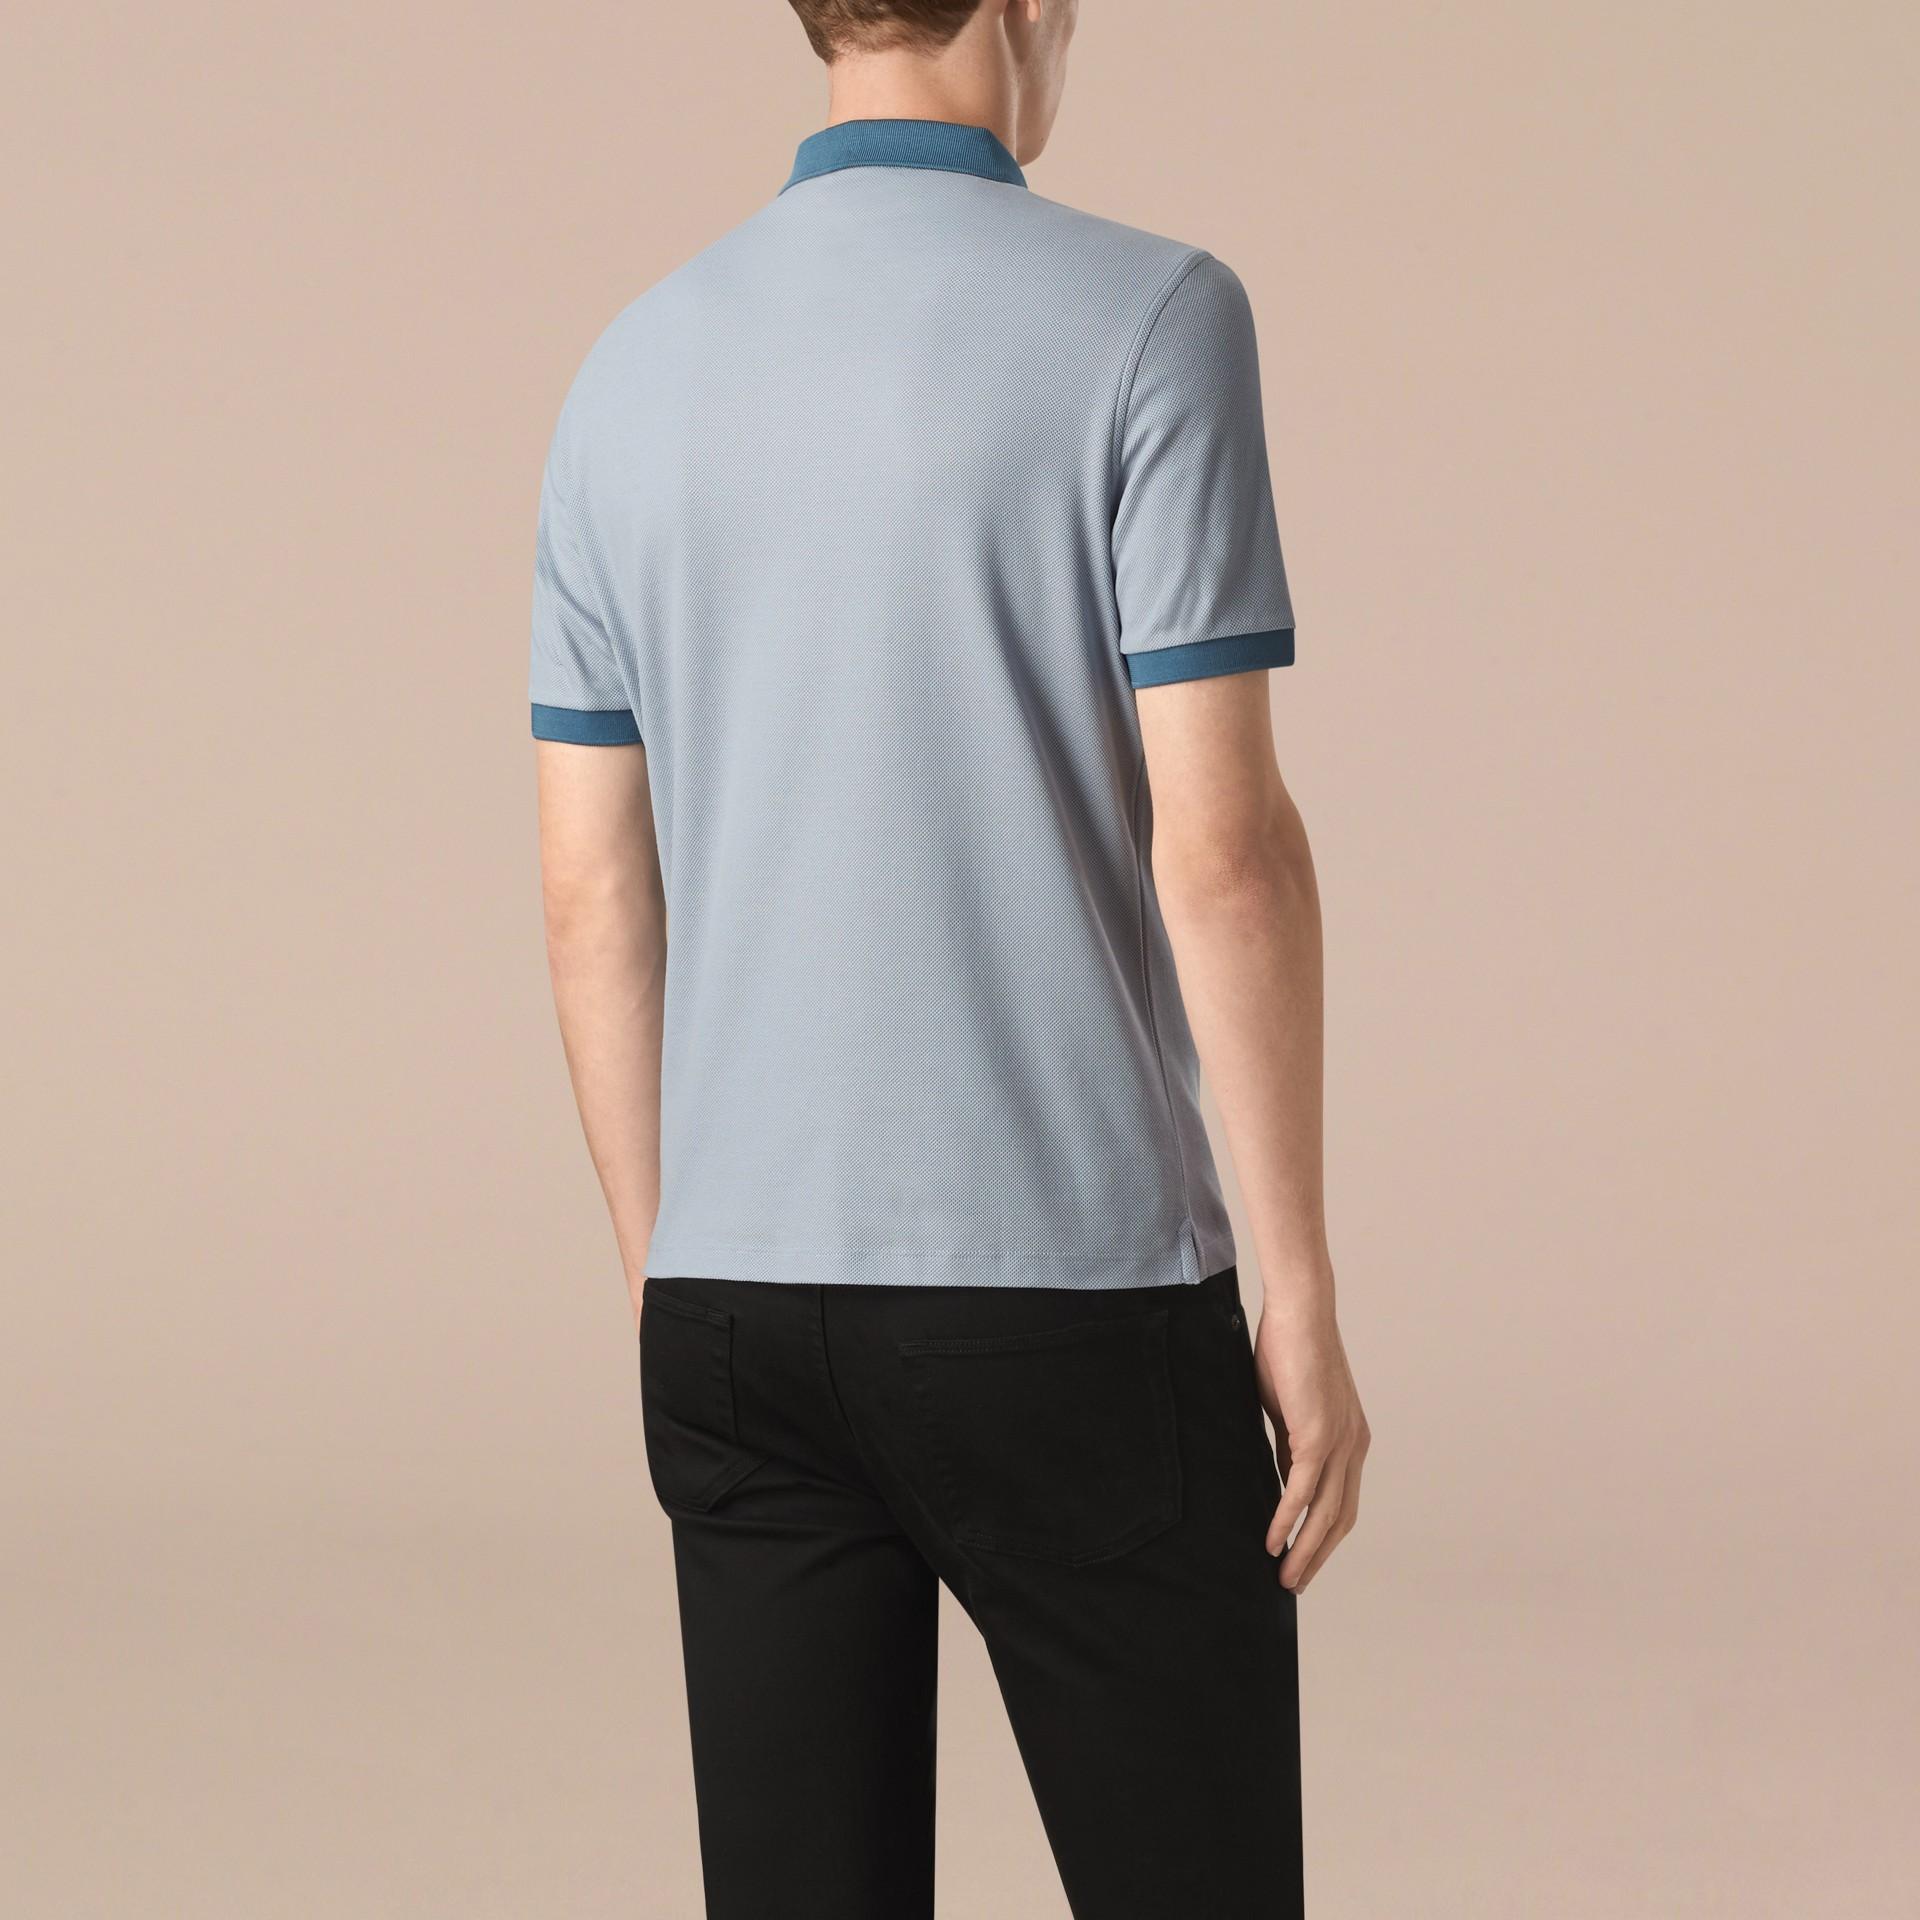 Helles himmelblau/lupinenblau Poloshirt aus mercerisiertem Baumwollpiqué Helles Himmelblau/lupinenblau - Galerie-Bild 2